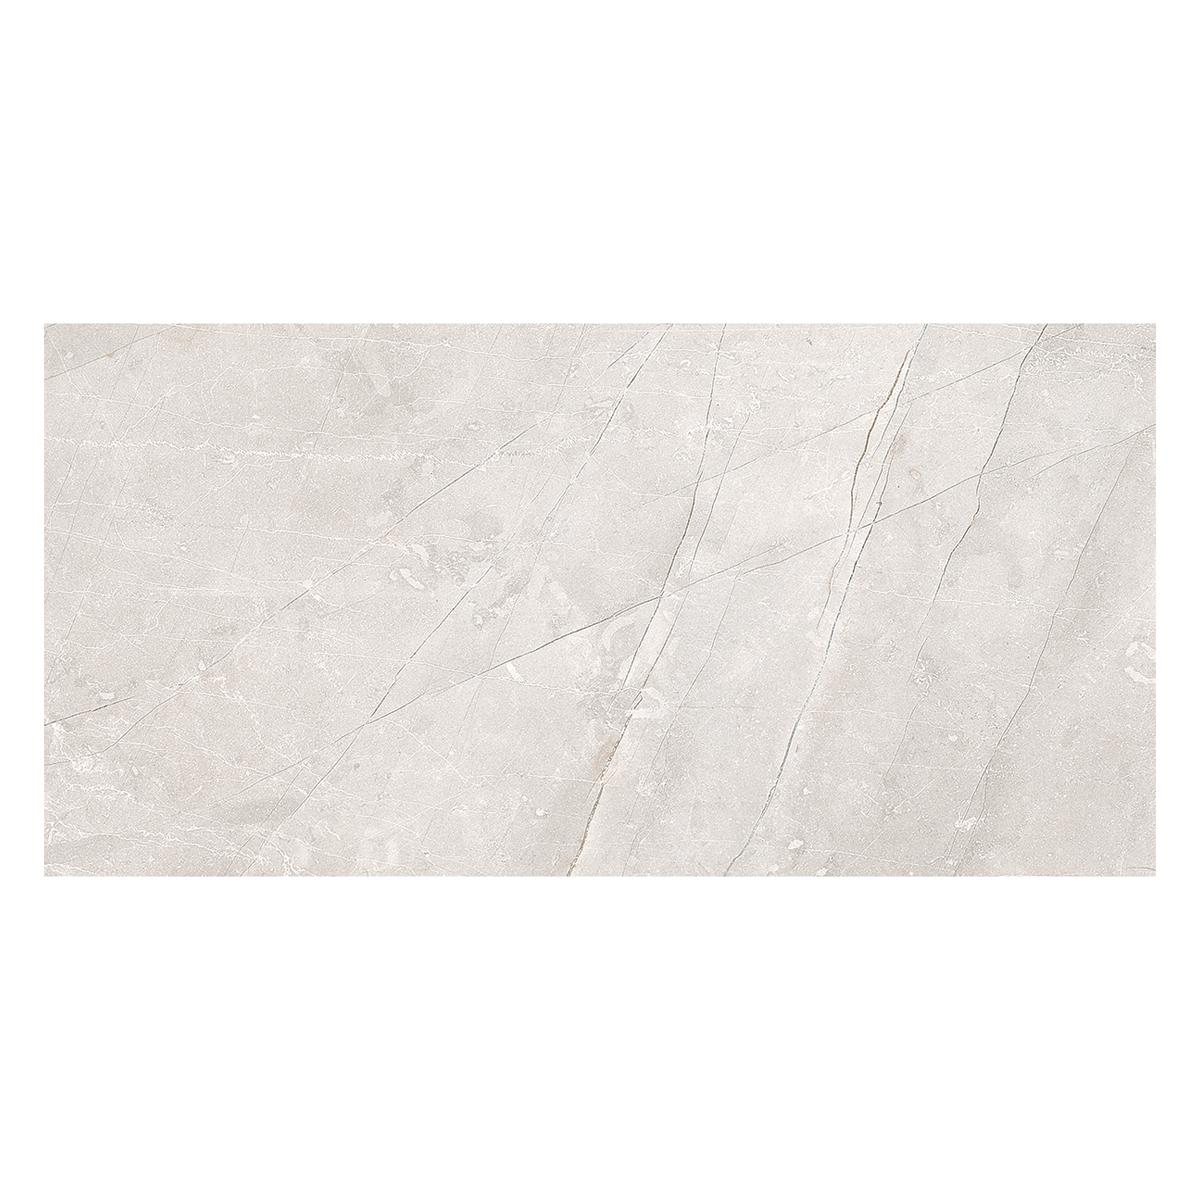 Gres Porcelánico Valencia Blanco Mate - 30X61 cm - 1.67 m2